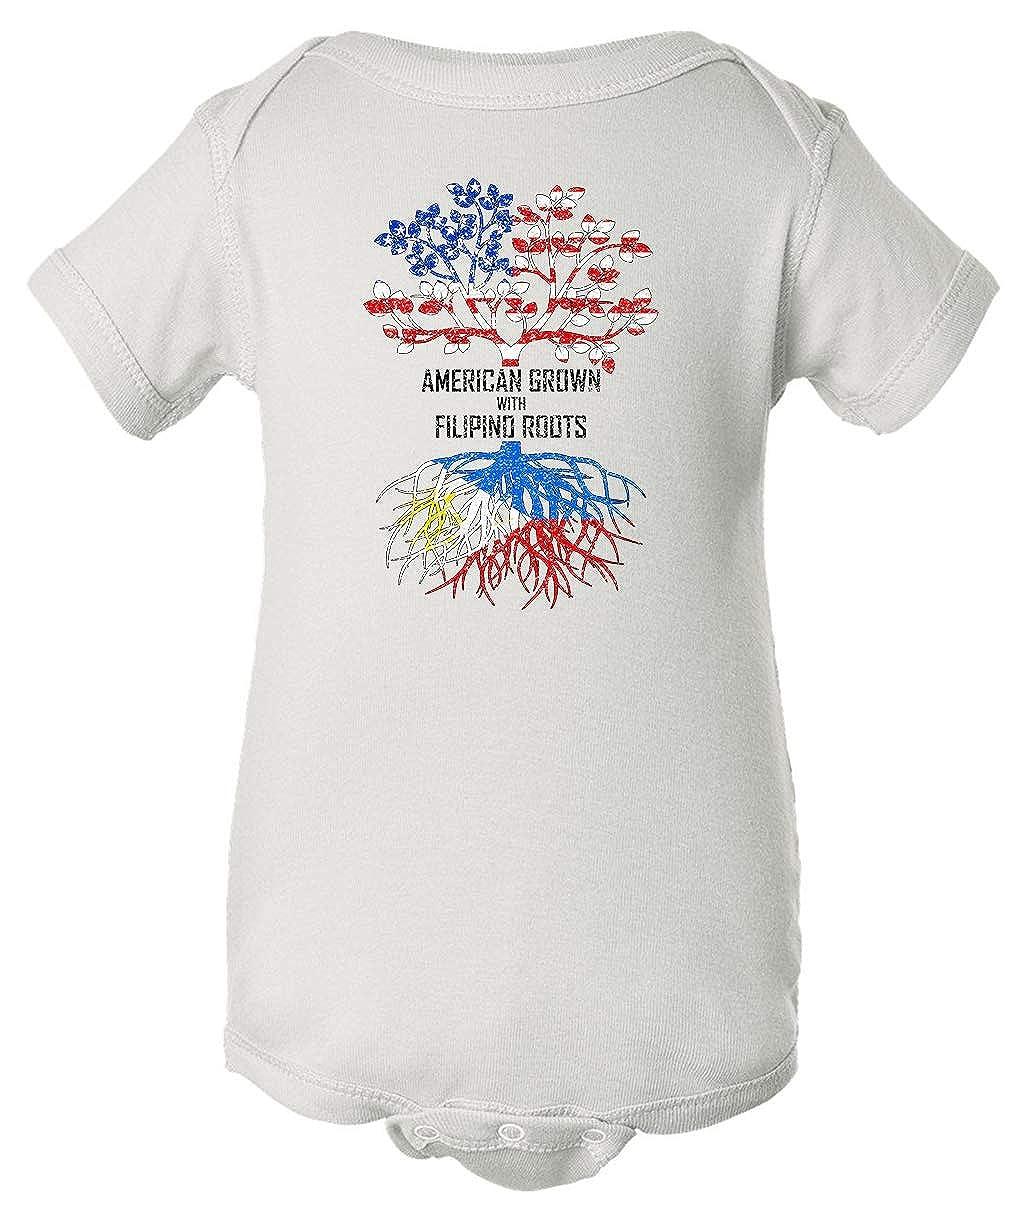 Tenacitee Babys American Grown with Filipino Roots Shirt